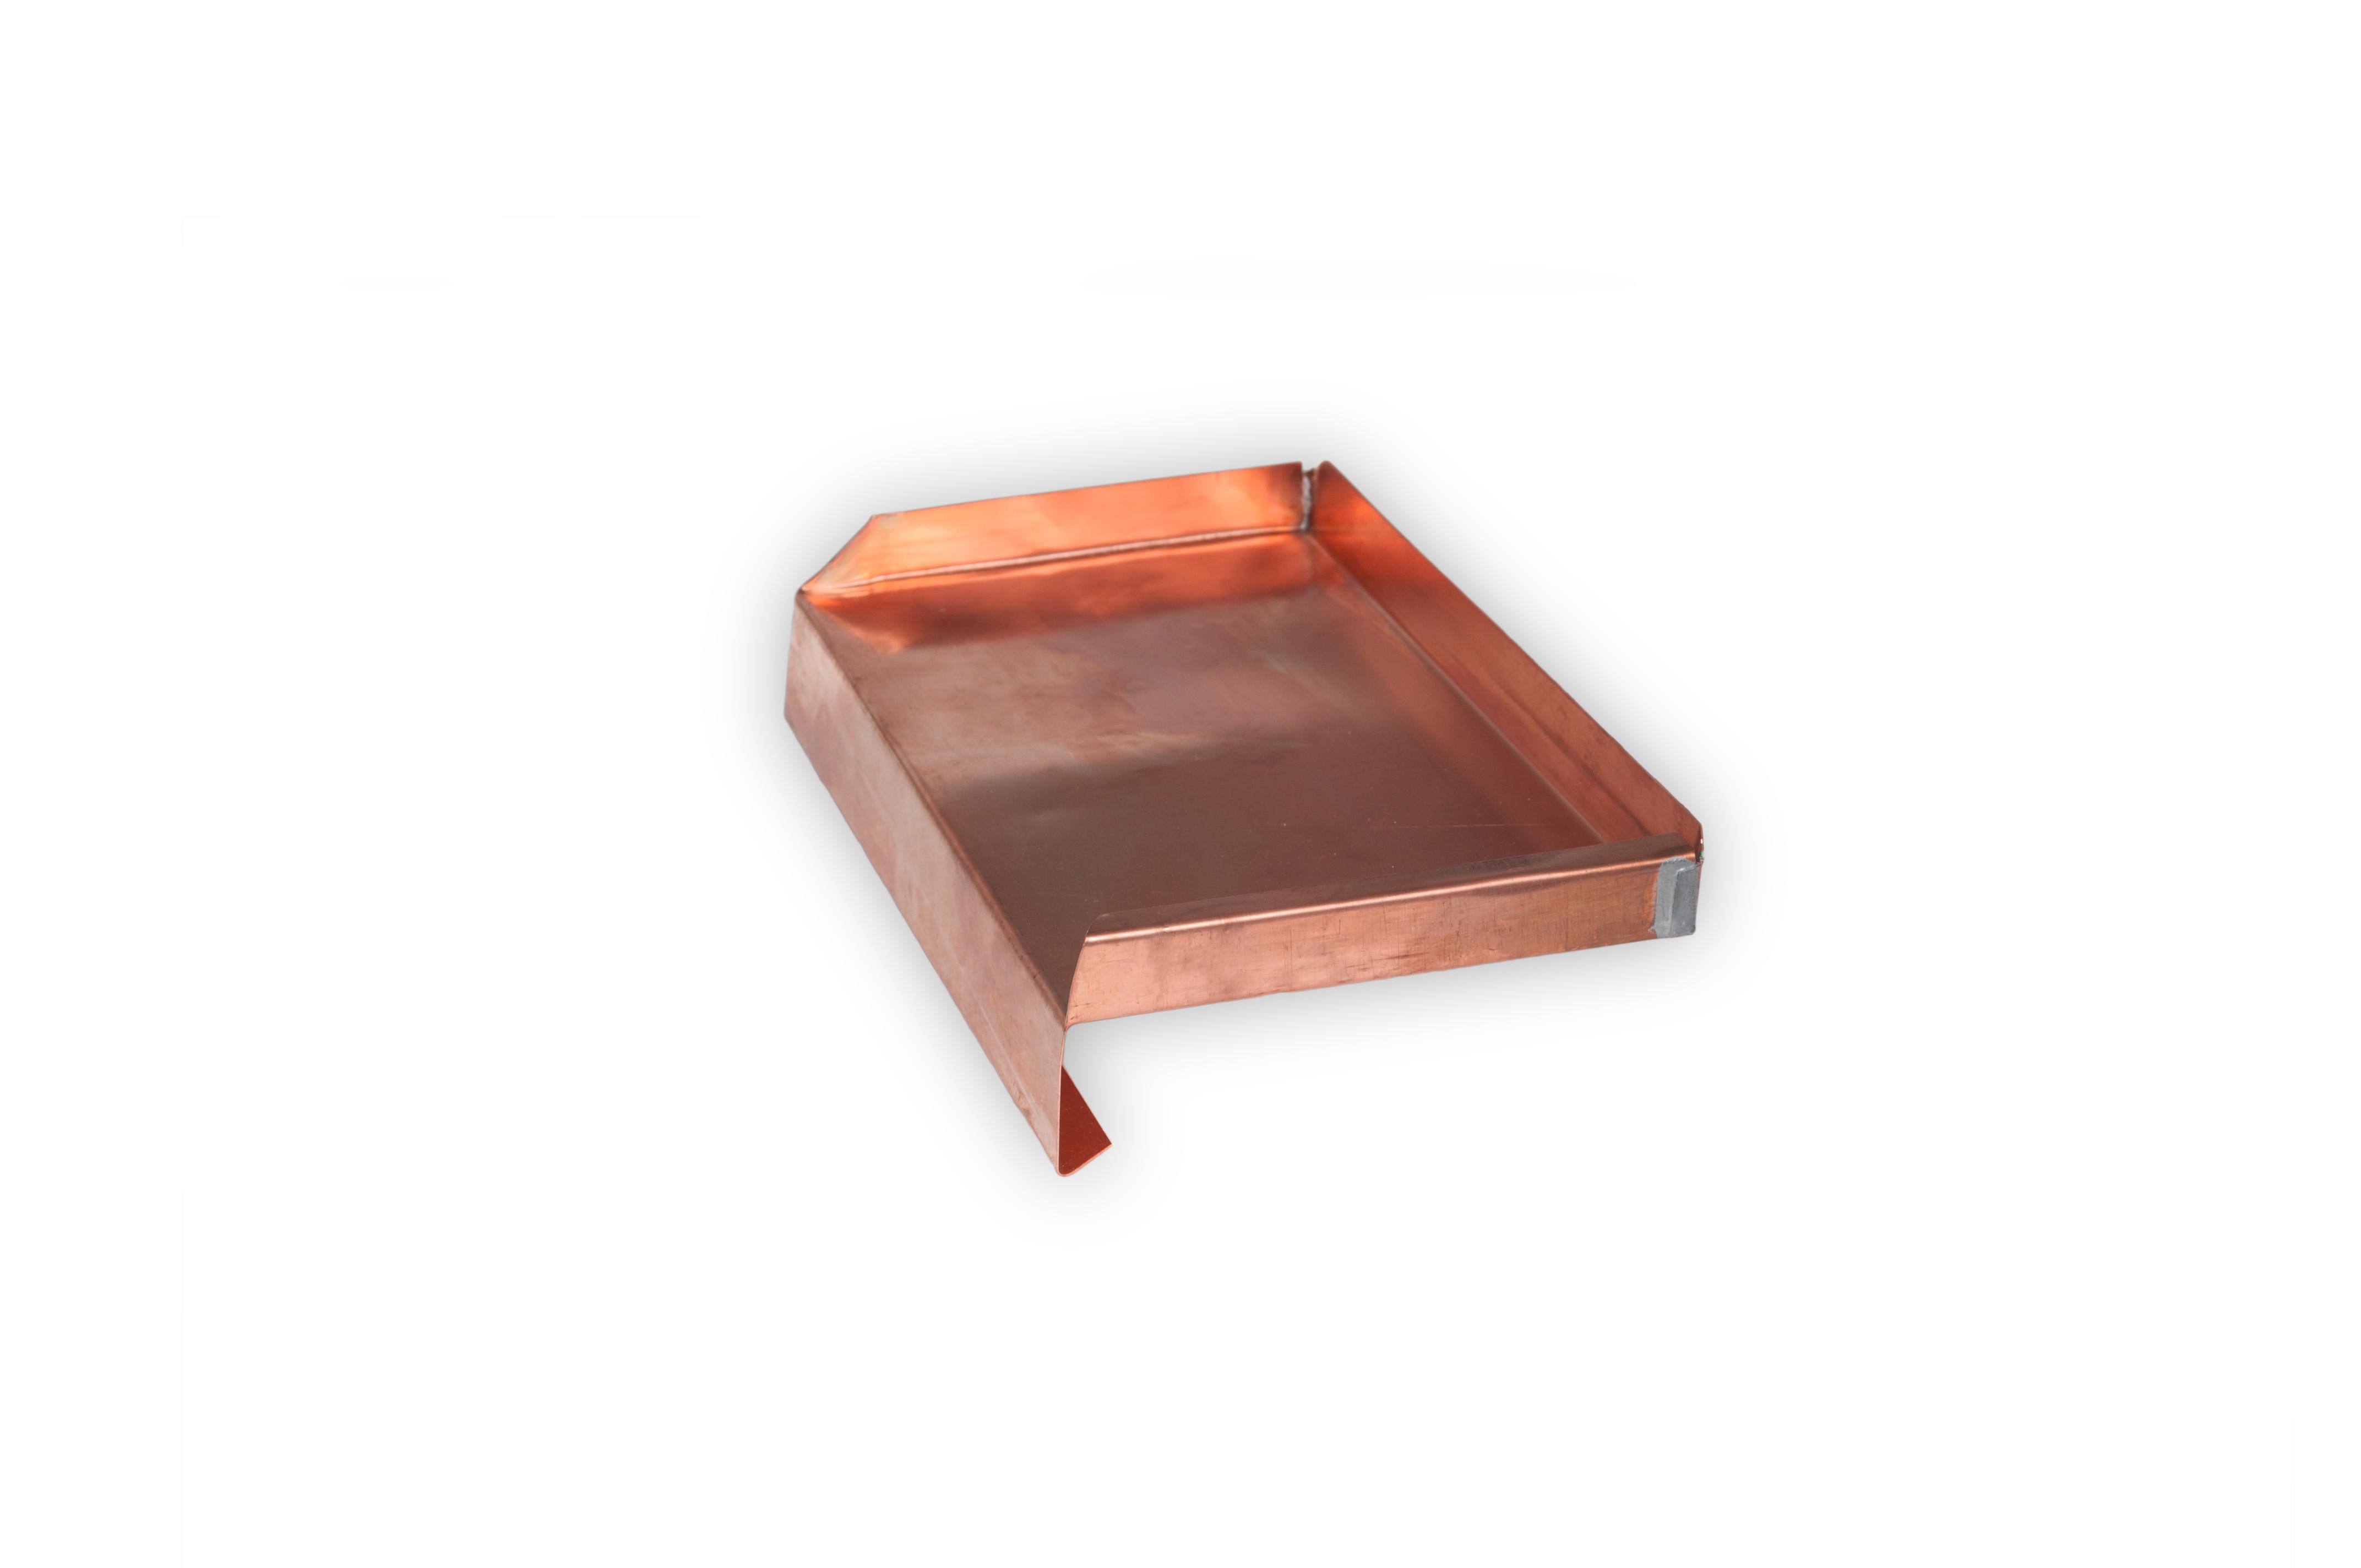 Garderobenstaender Aus Kupfer : Fensterbank fensterb?nke aus kupfer profi